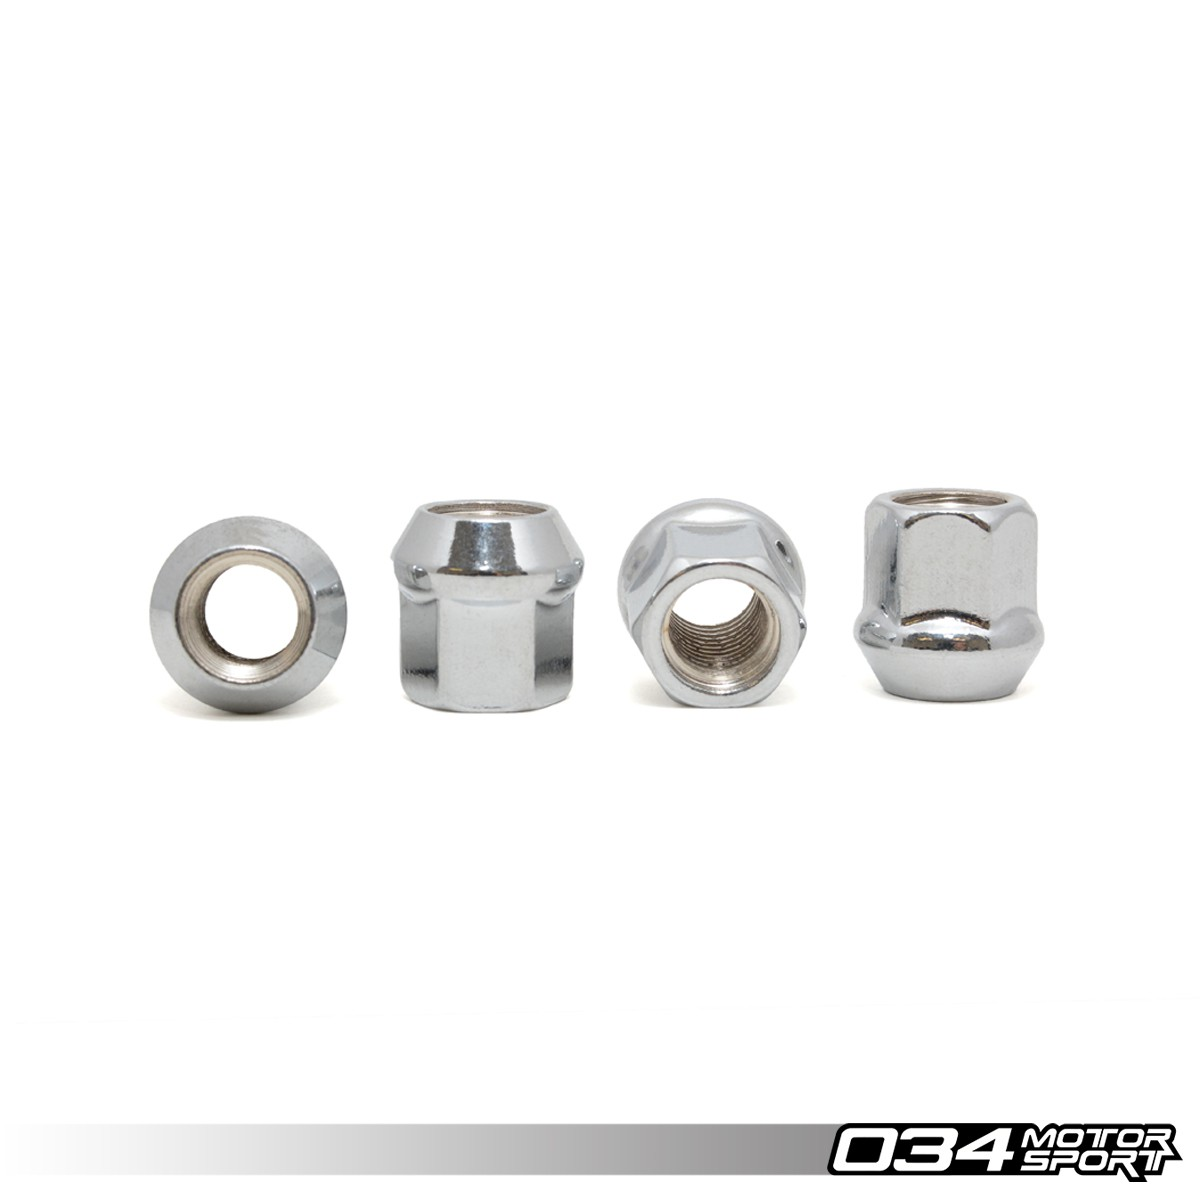 Wheel Nut, Cone Seat, M12x1.5 | 034-604-1000